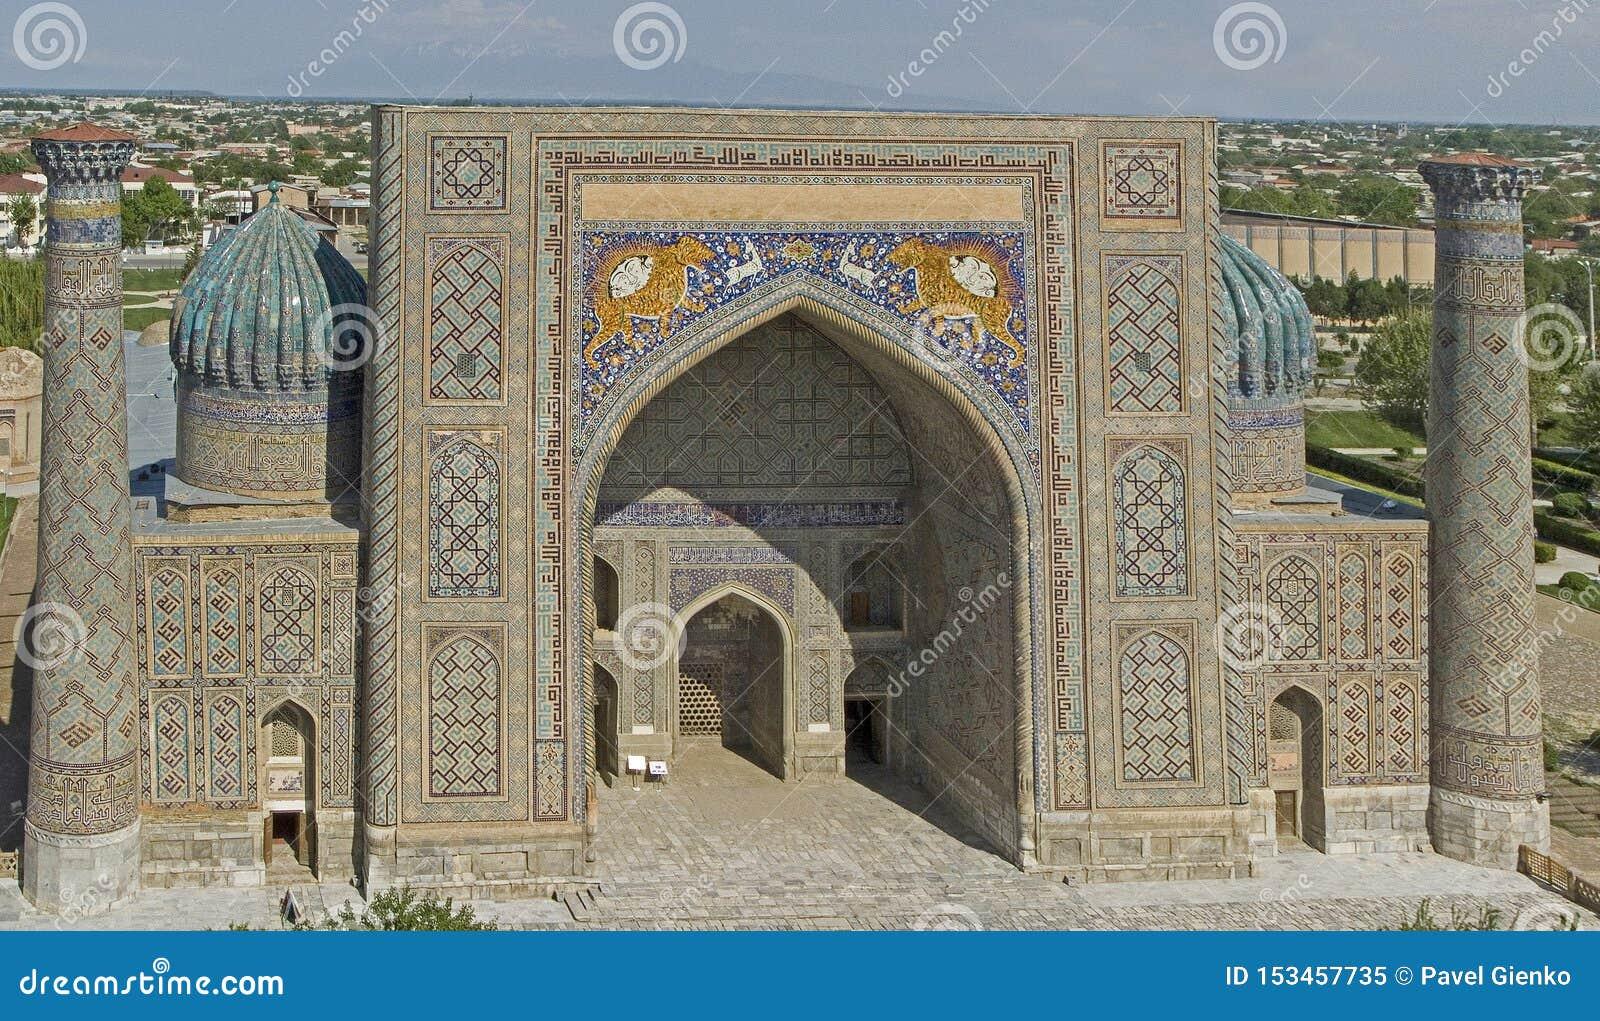 Samarkand.Medres Shir Dor